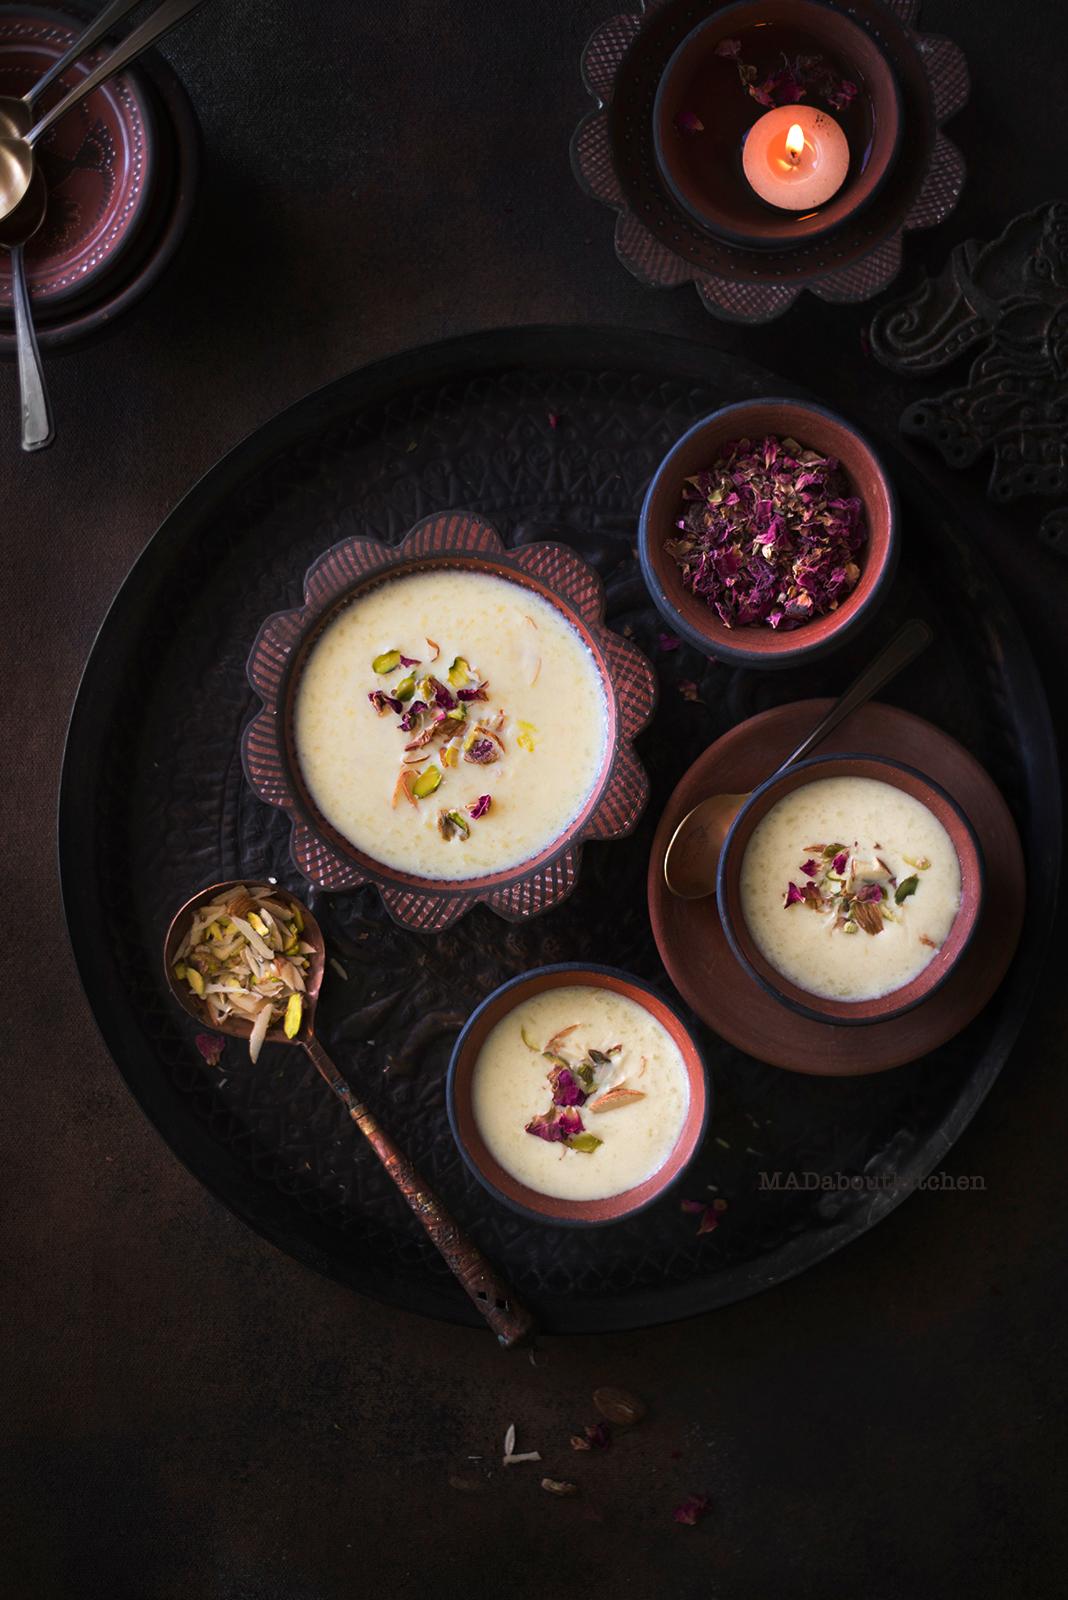 Haalu Paayasa or Akki Paayasa is the basic paayasa that we make at home. Haalu Paayasa is prepared with just few basic ingredients like milk, rice, sugar and cardamom.